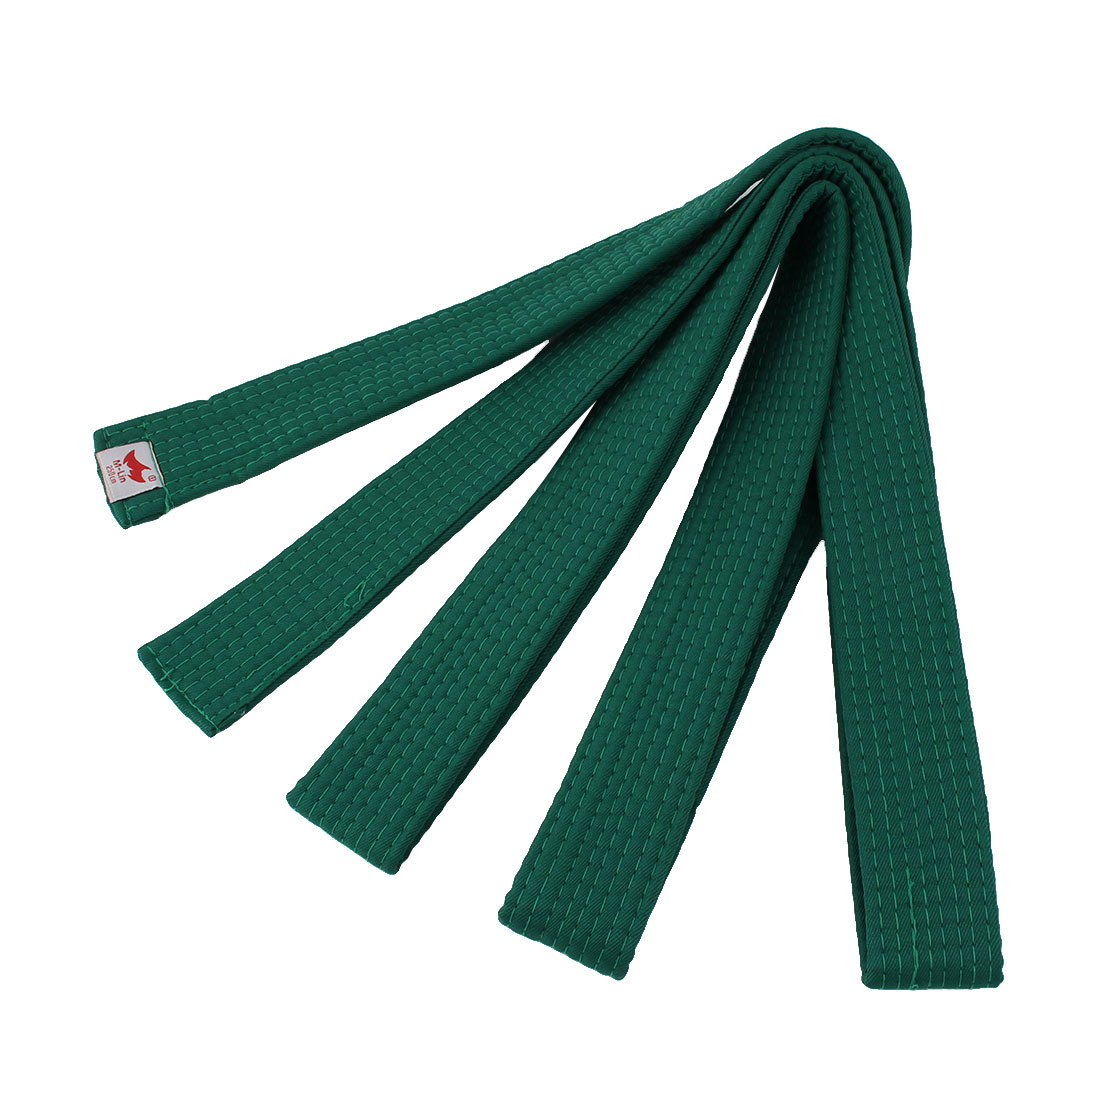 Judo Taekwondo Cotton Blend Band Belt Green 250cm Length